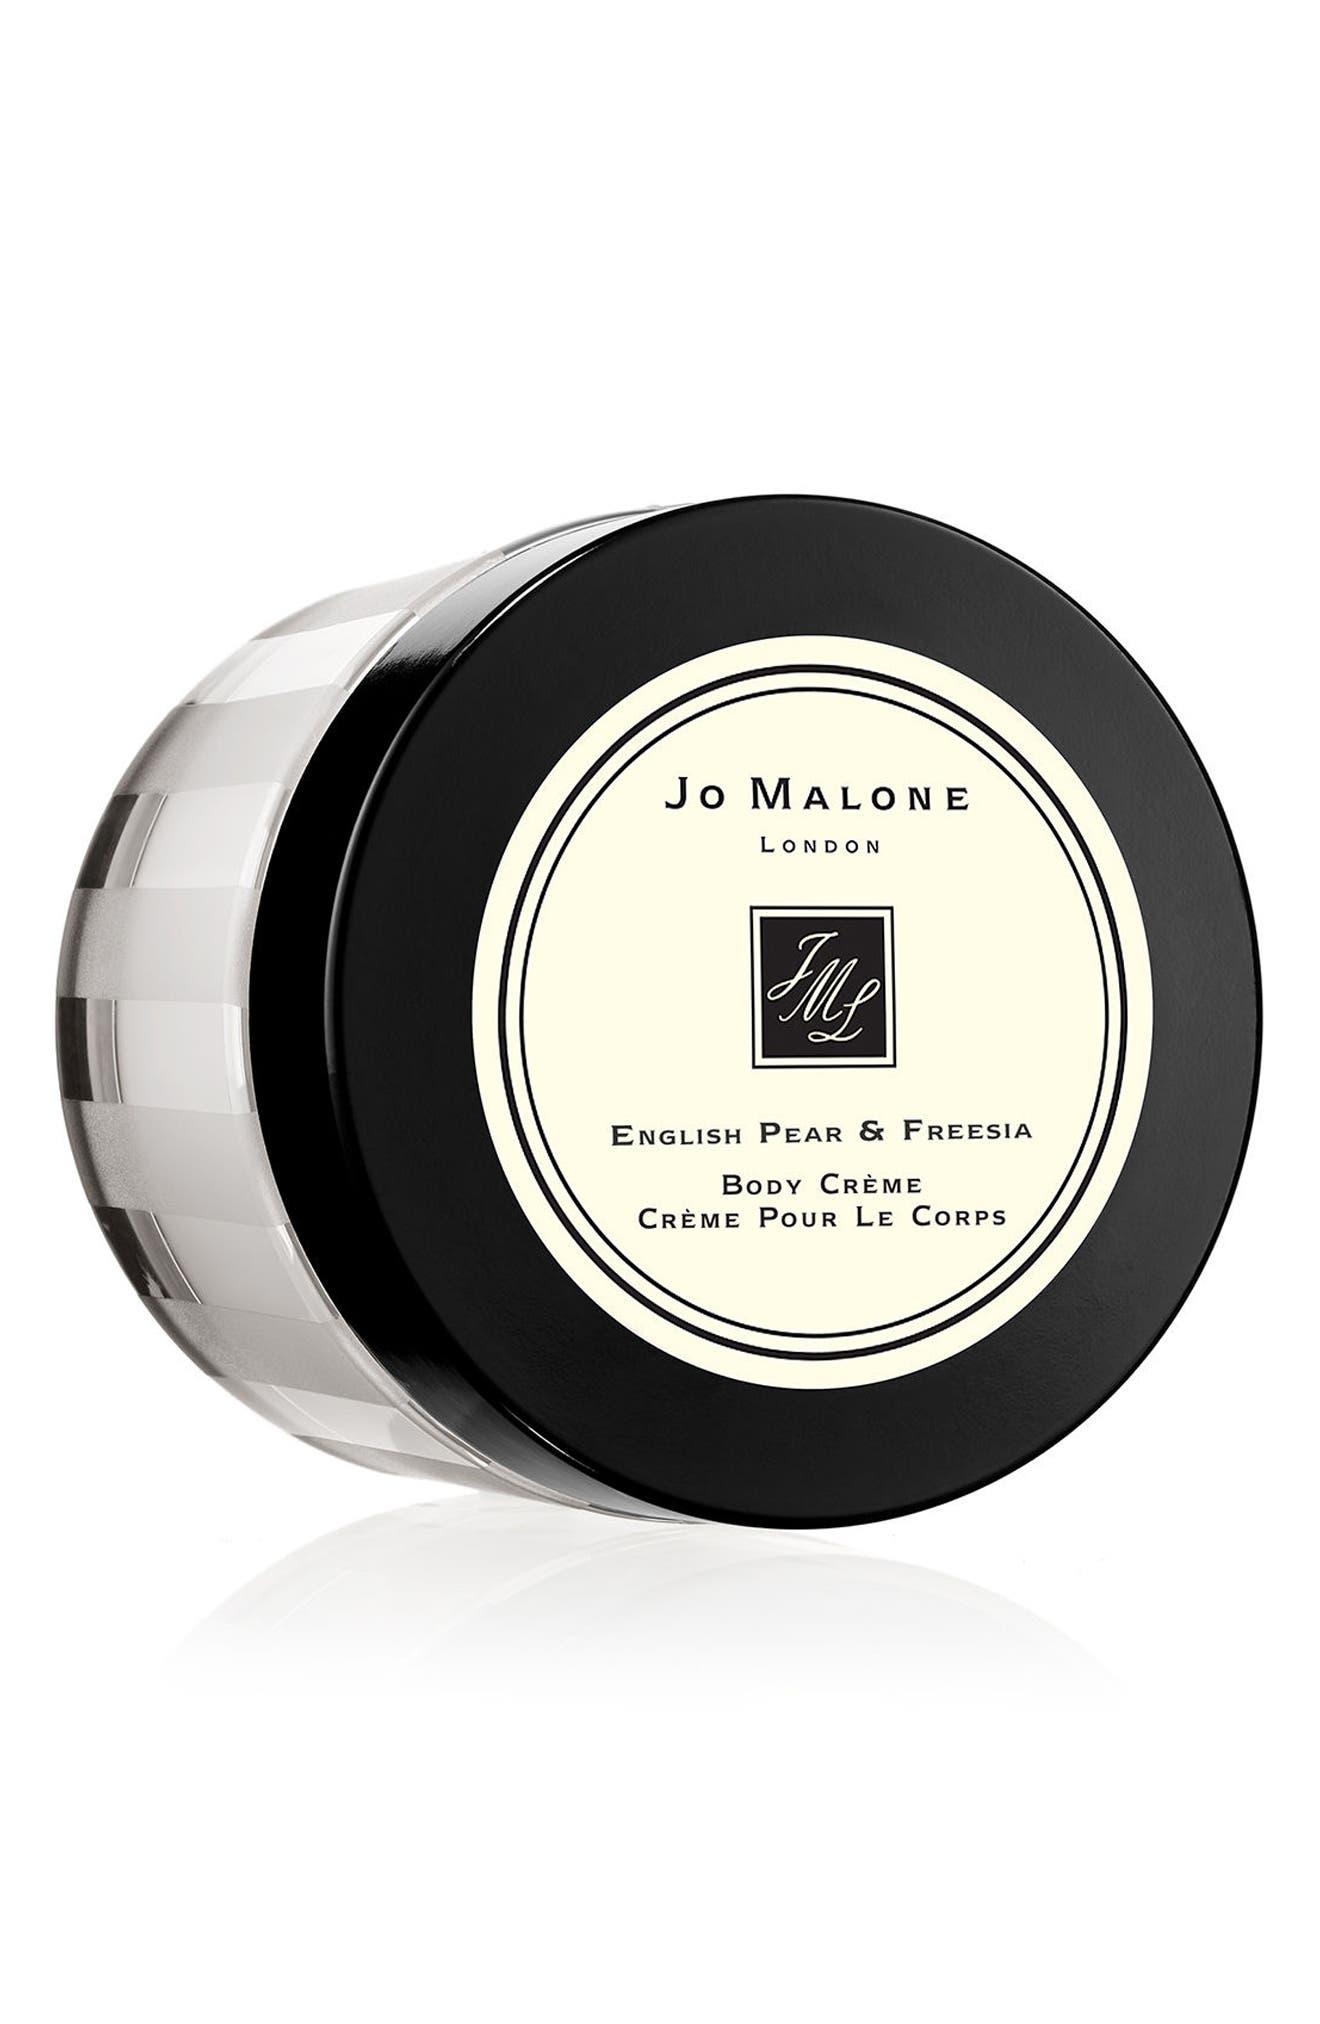 Jo Malone London™ Travel English Pear & Freesia Body Crème